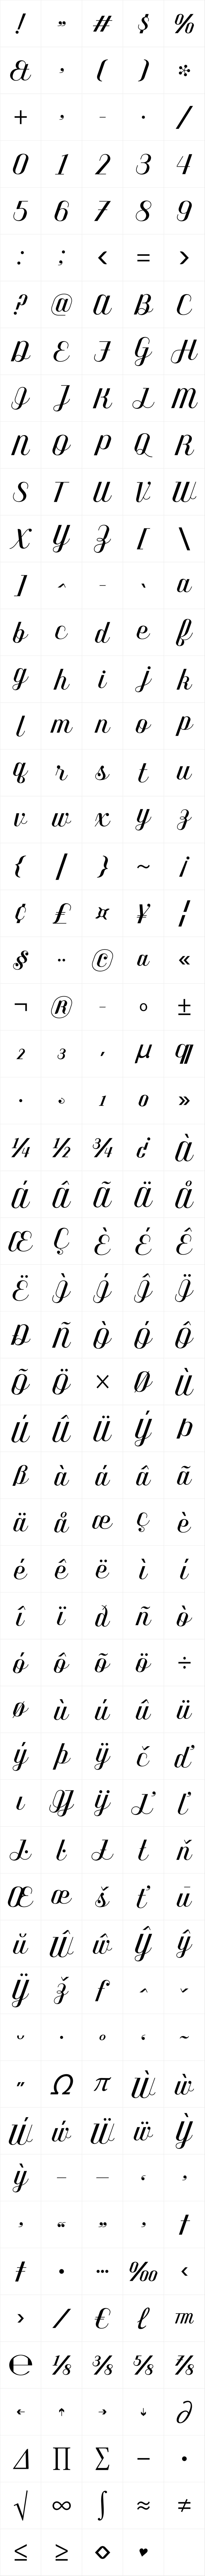 Benson Script No 10